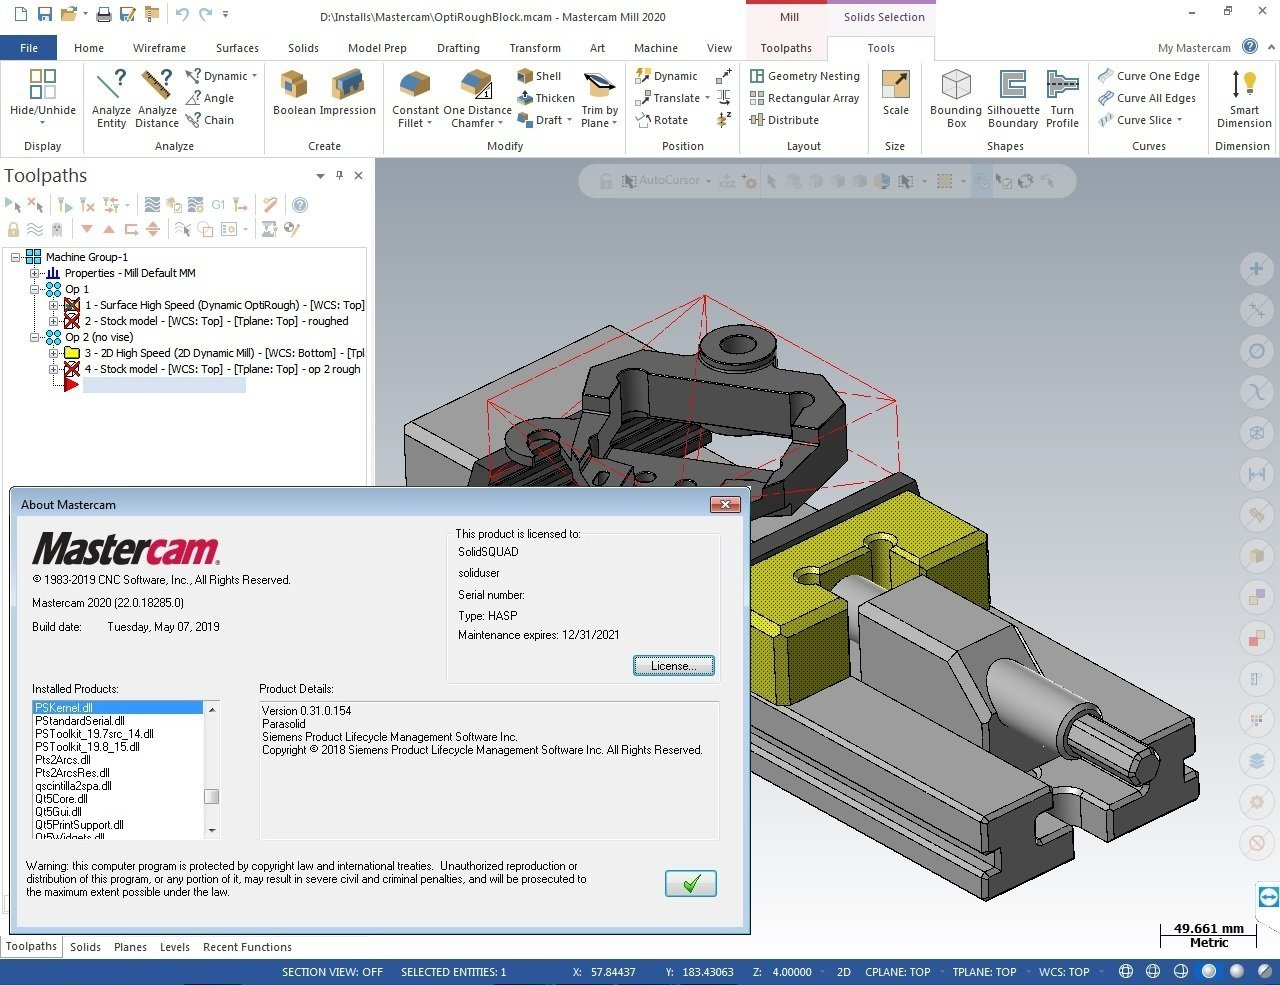 Download Mastercam 2020 v22 0 18285 0 (x64) - SoftArchive